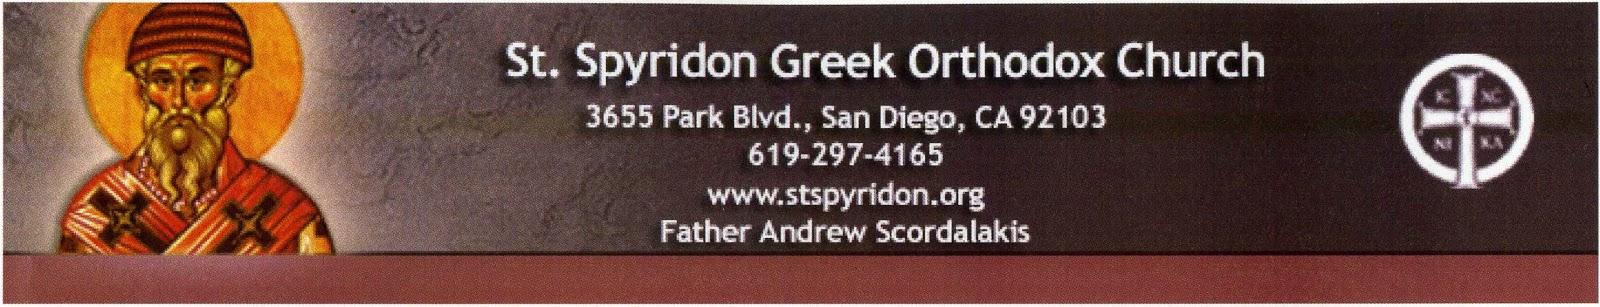 http://www.stspyridon.org/index.html